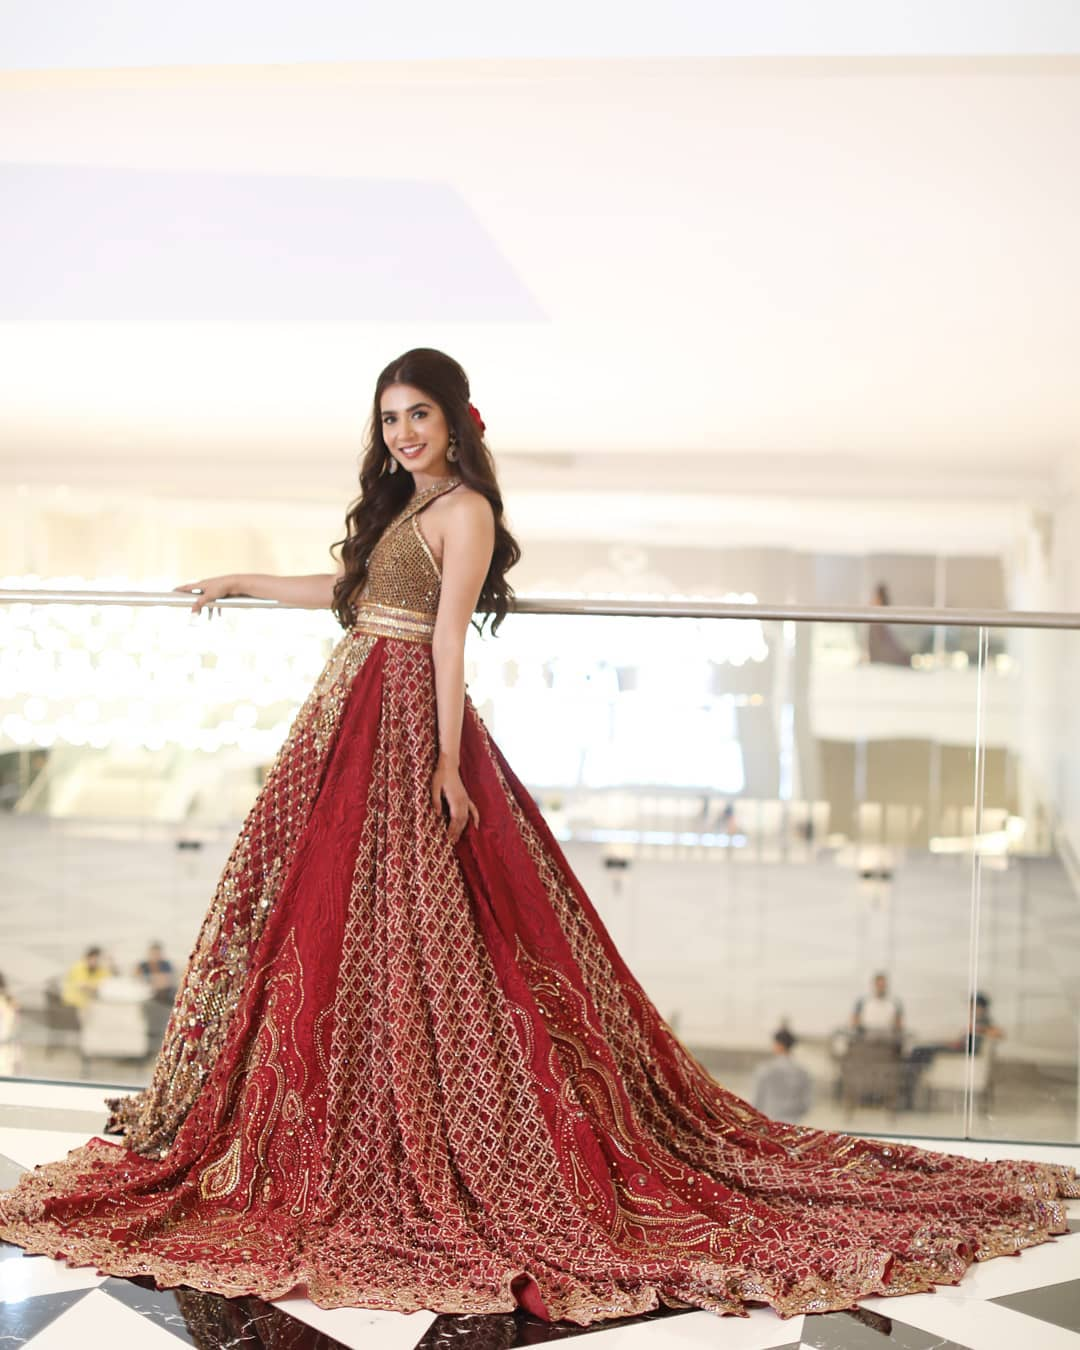 Awesome Pictures of Actress Mansha Pasha